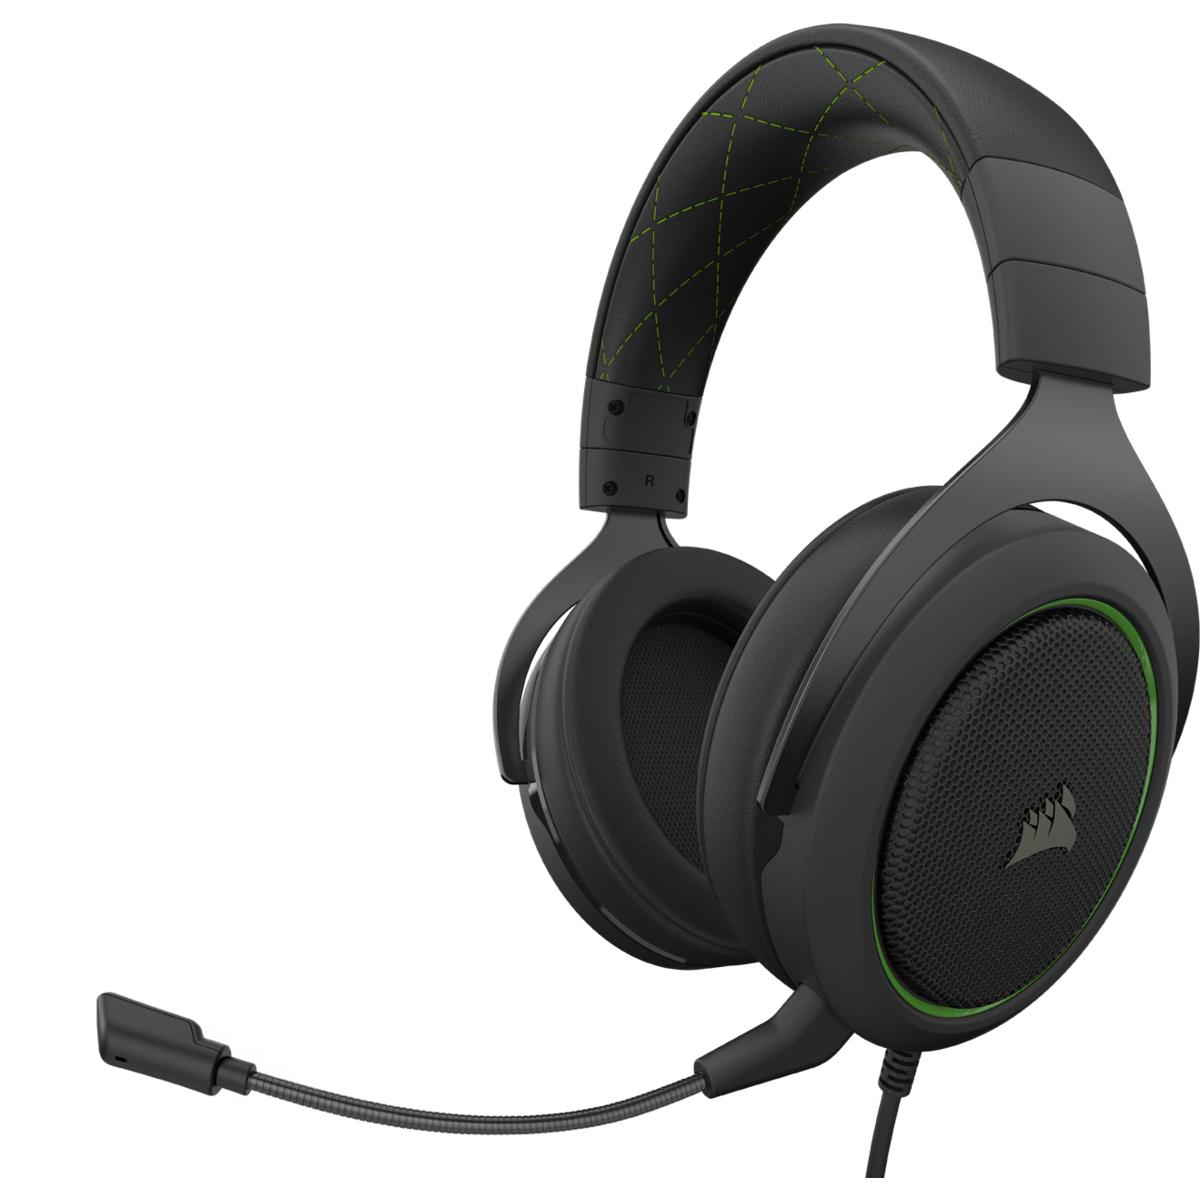 Corsair HS50 PRO STEREO Headset Head-band Black,Green